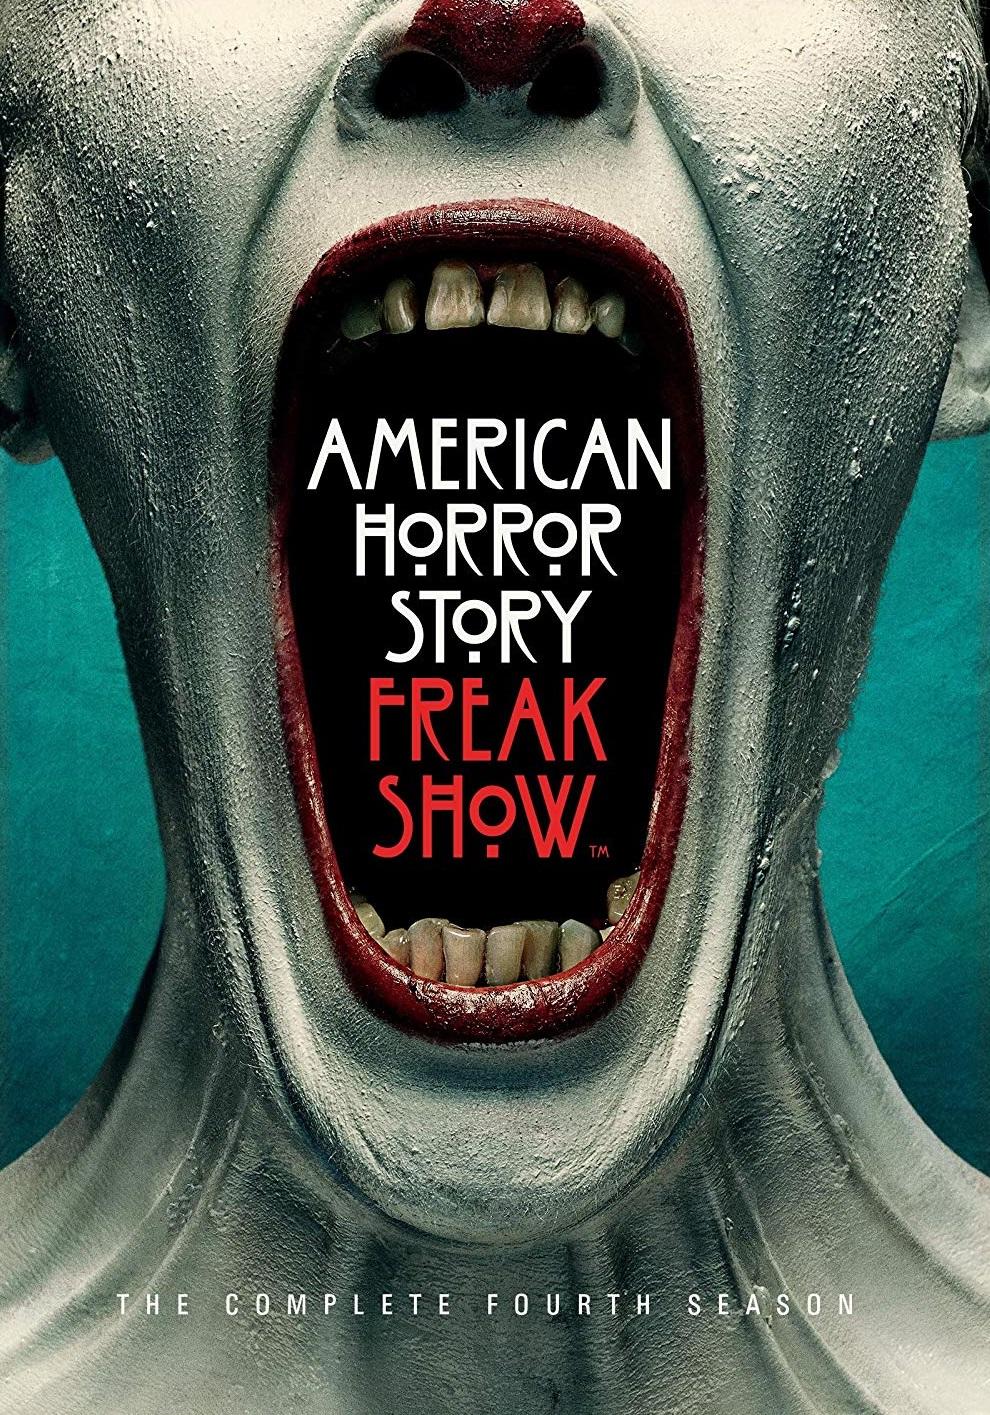 American Horror Story - The Complete Fourth Season DVD.jpg